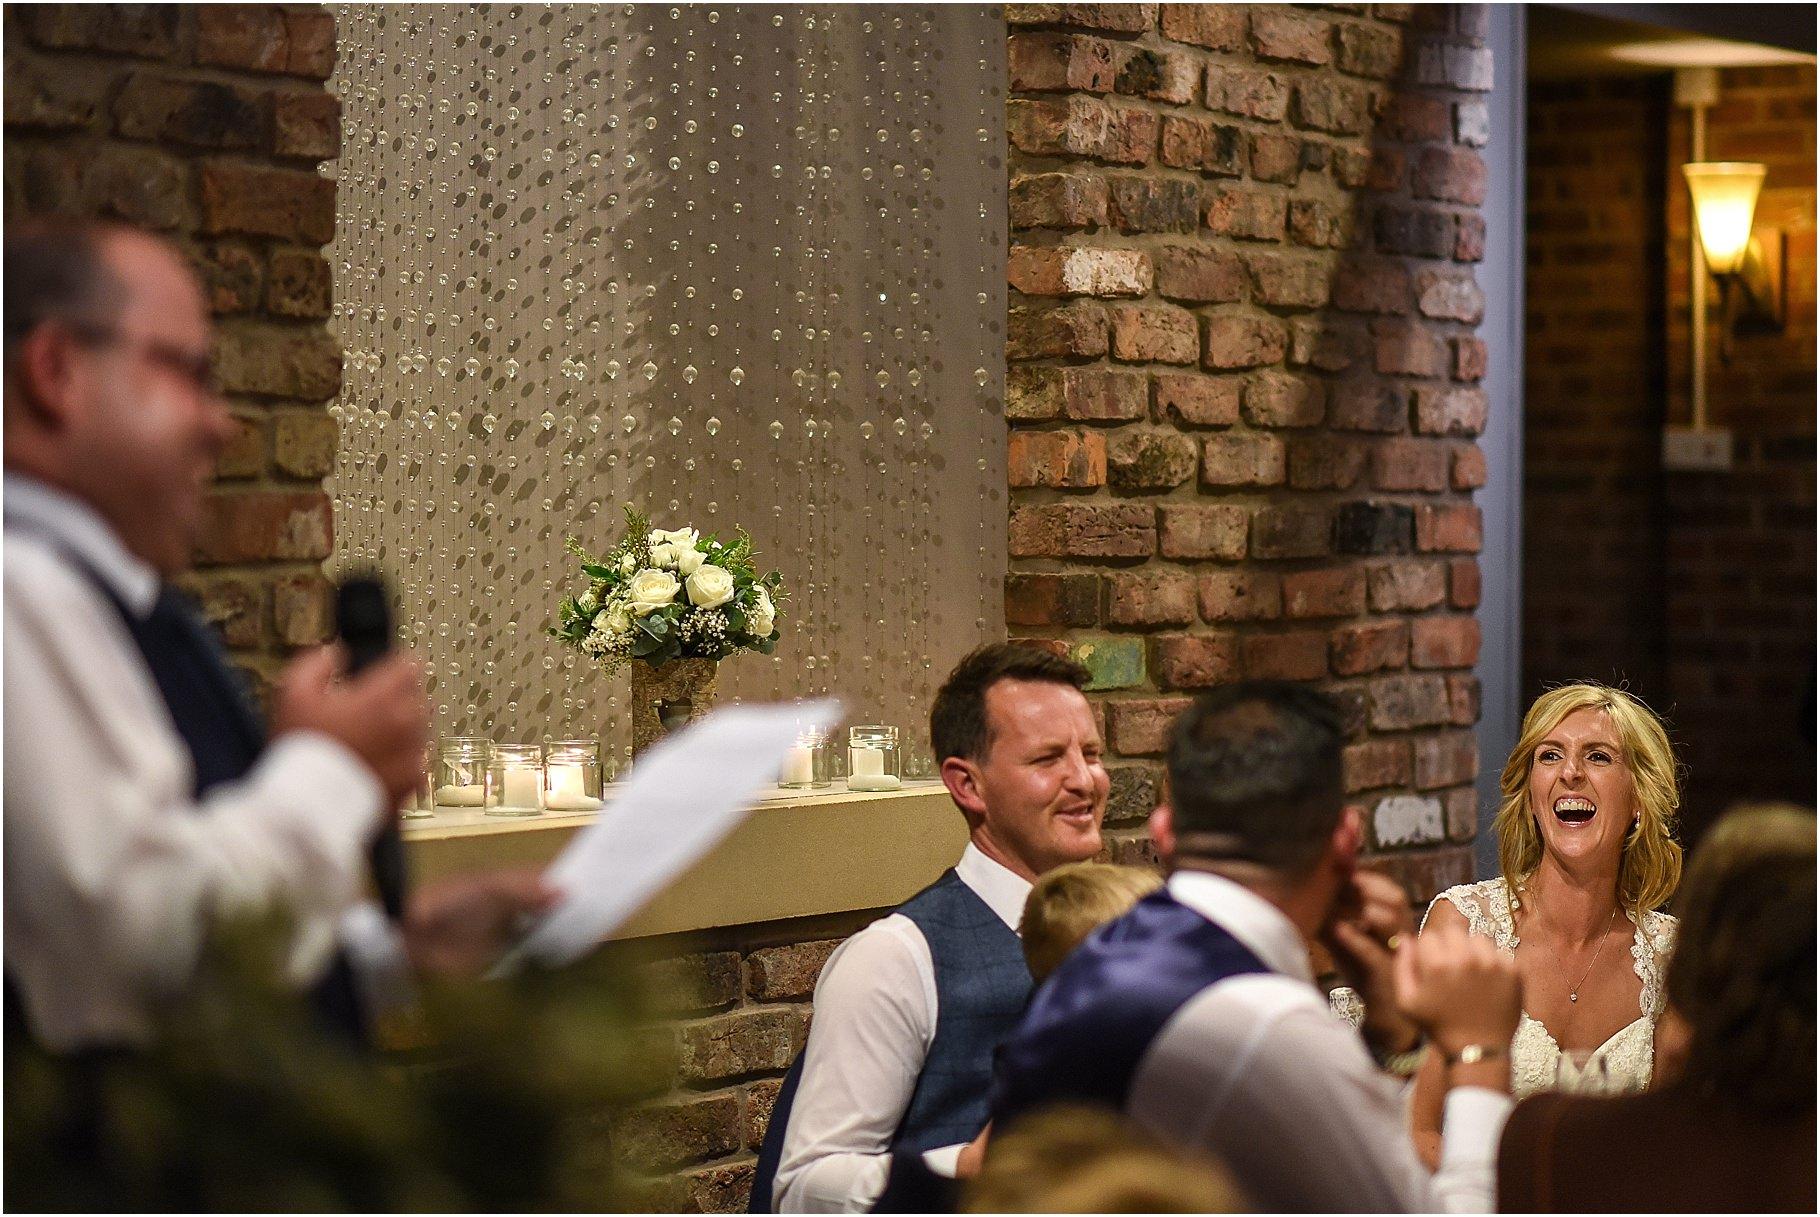 bartle-hall-wedding-photography-078.jpg